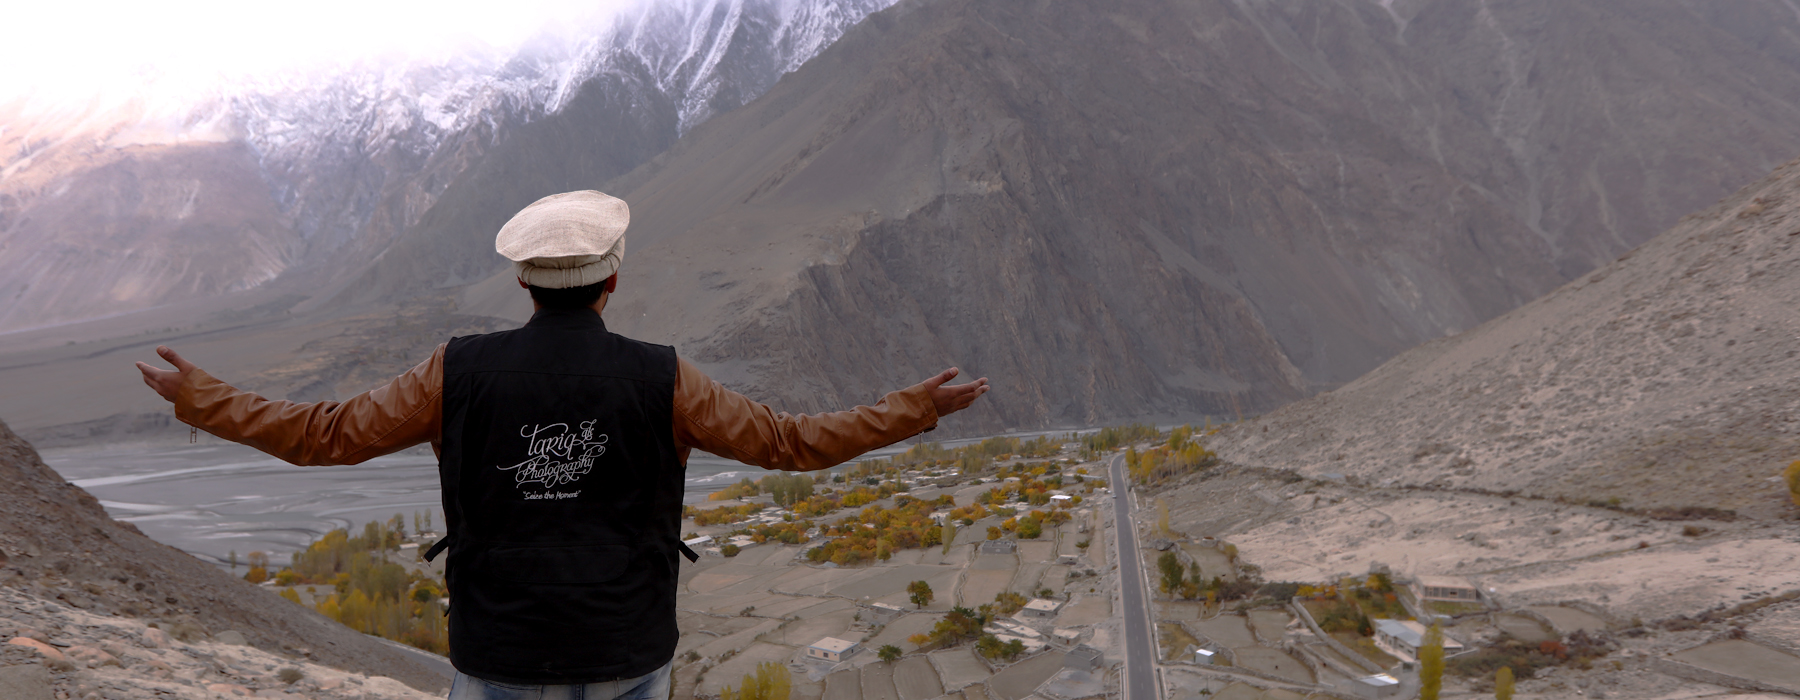 cinematic broll in travel vlog